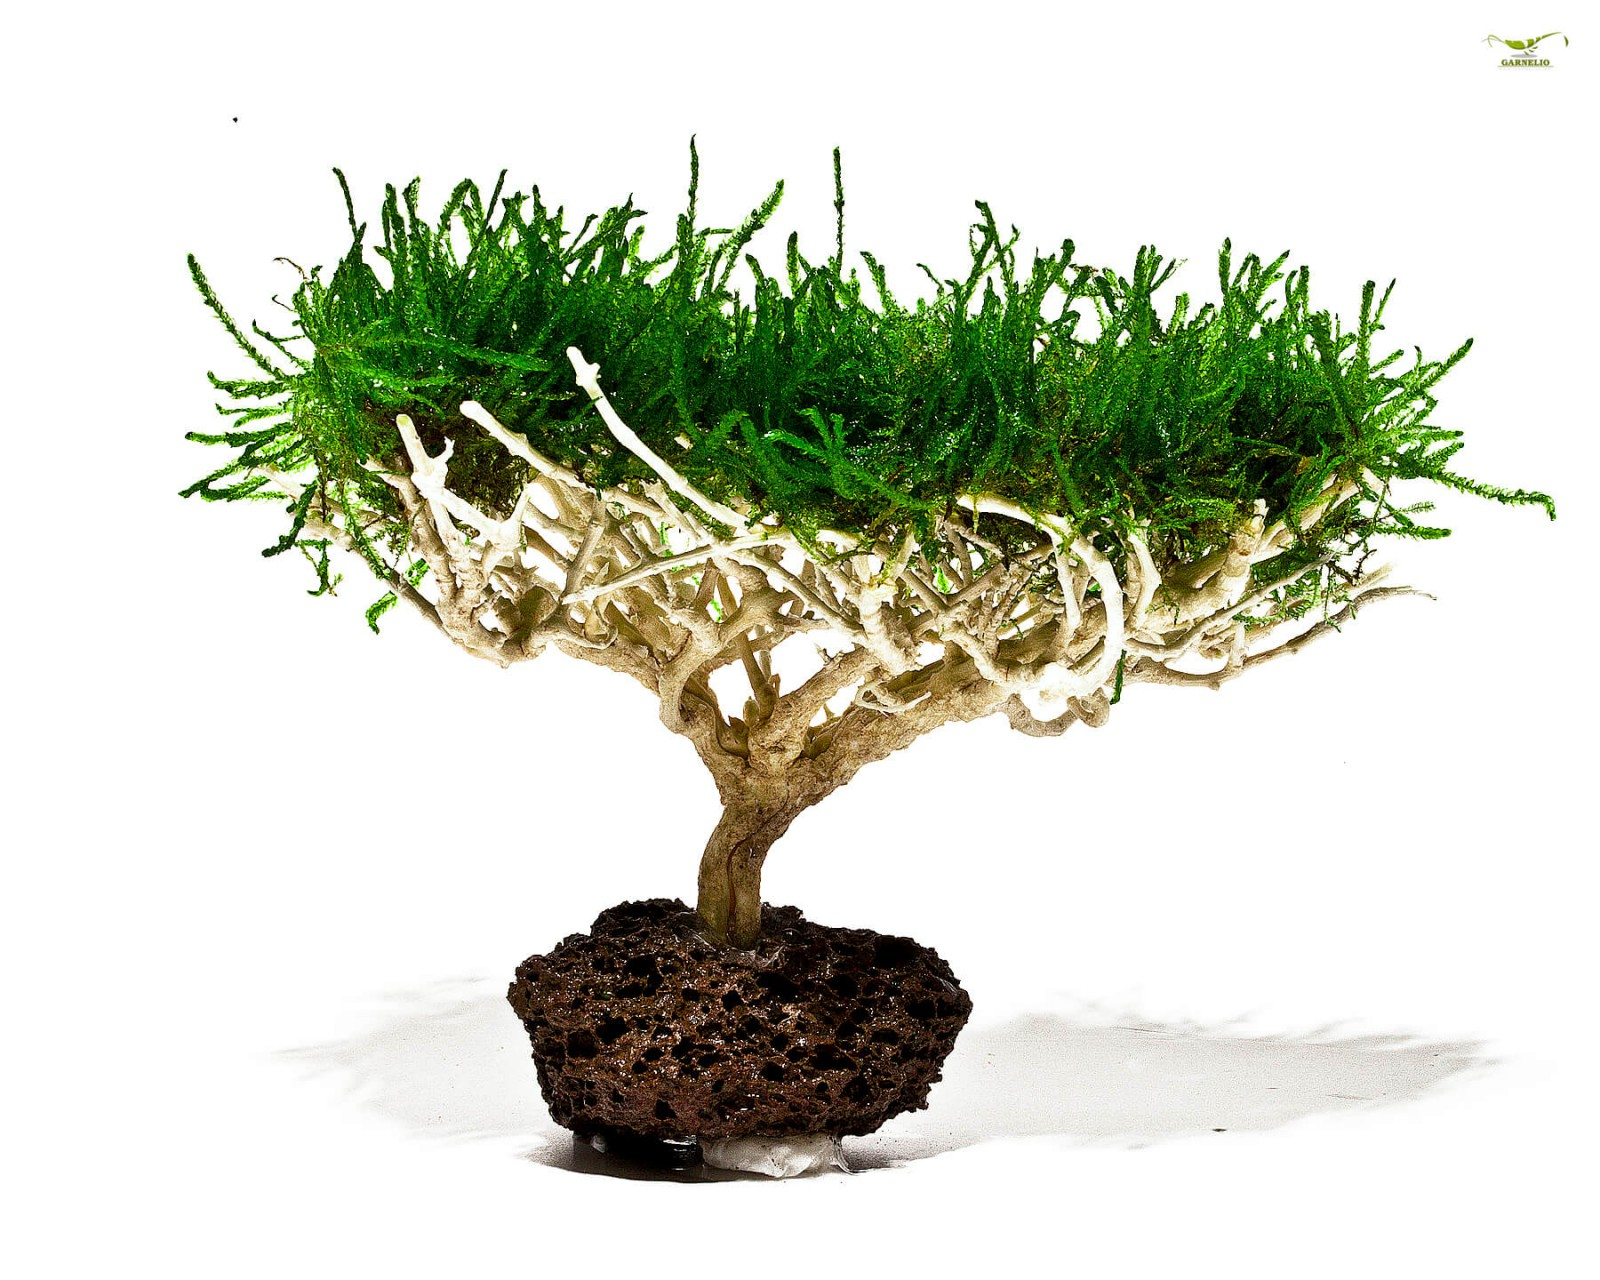 bepflanzte deko aquariumpflanzen garnelen onlineshop. Black Bedroom Furniture Sets. Home Design Ideas